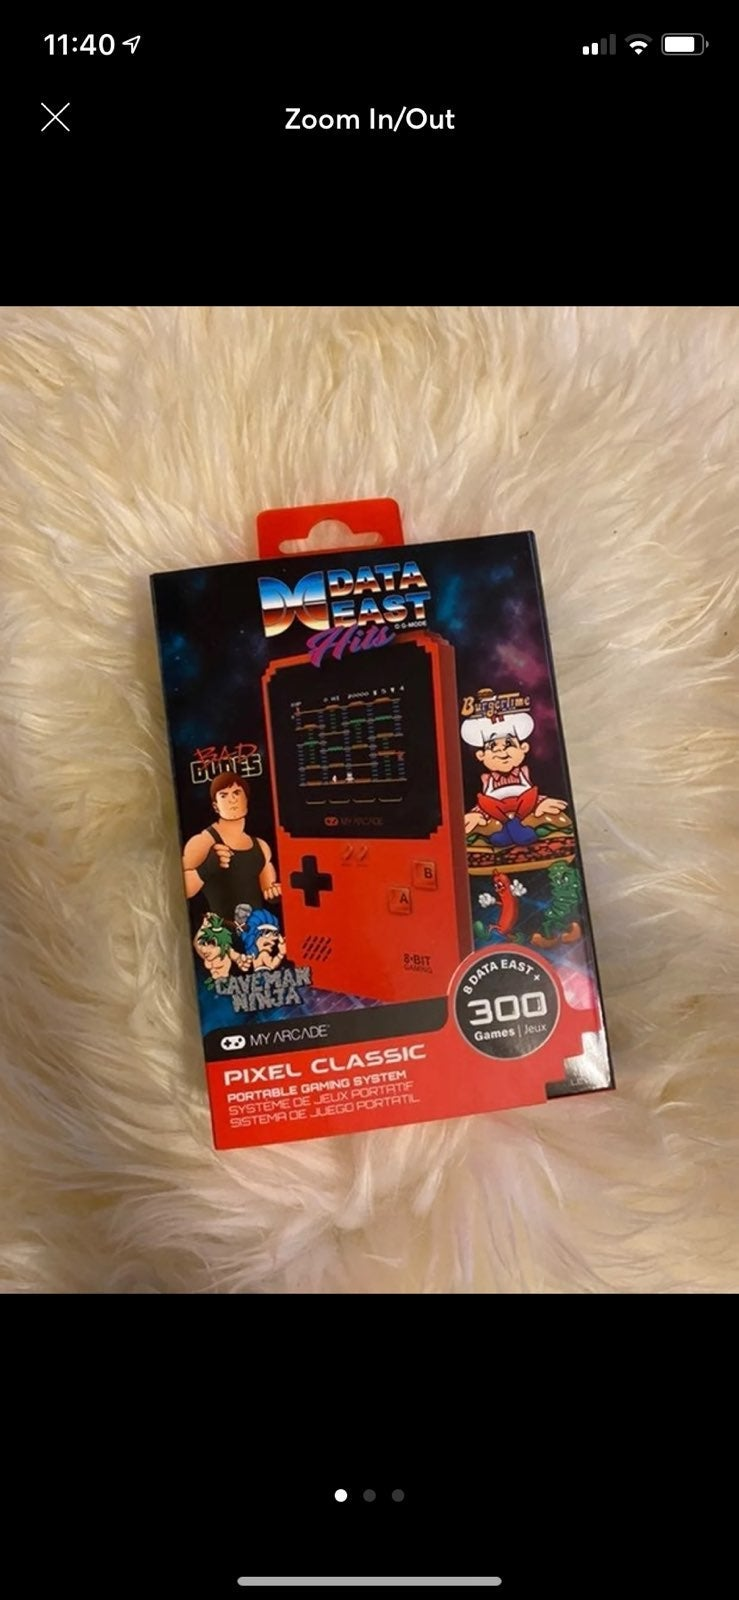 My arcade Handheld 300 Games new